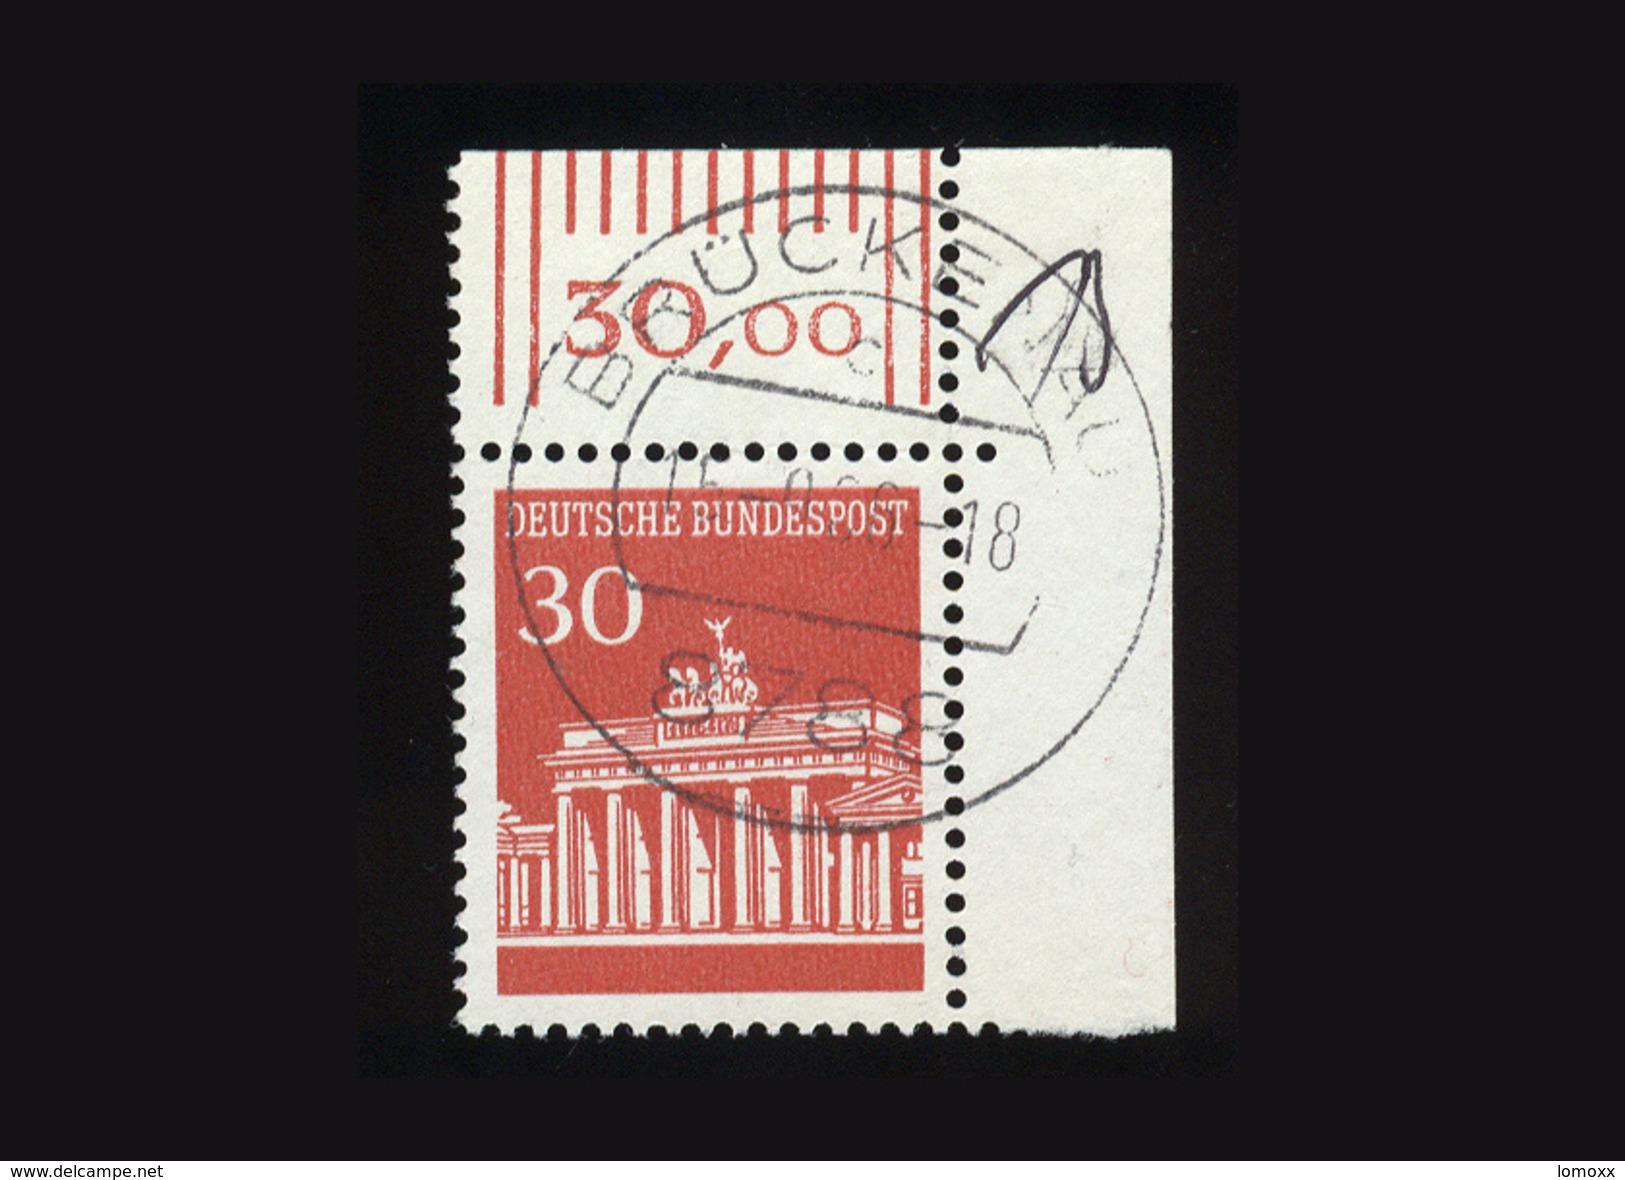 BRD 1966, Michel-Nr. 508 Freimarken Brandenburger Tor, 30 Pf., Eckrand Rechts Oben, Gestempelt - BRD